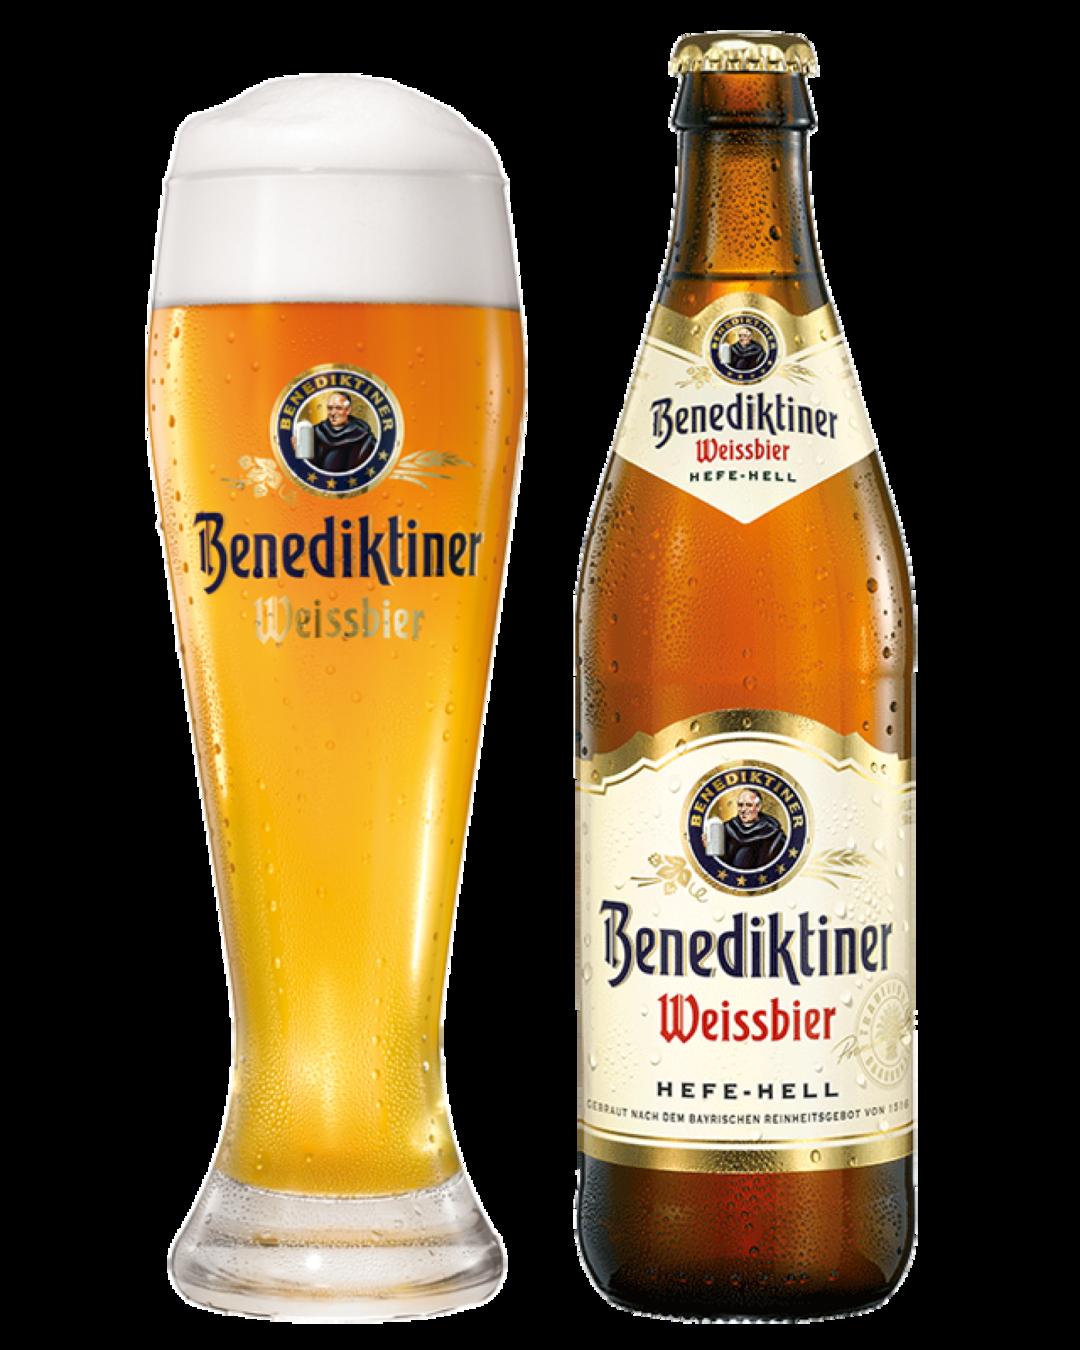 Benedikter Weissbier Fles 50cl (5.4%) - Bestelonline